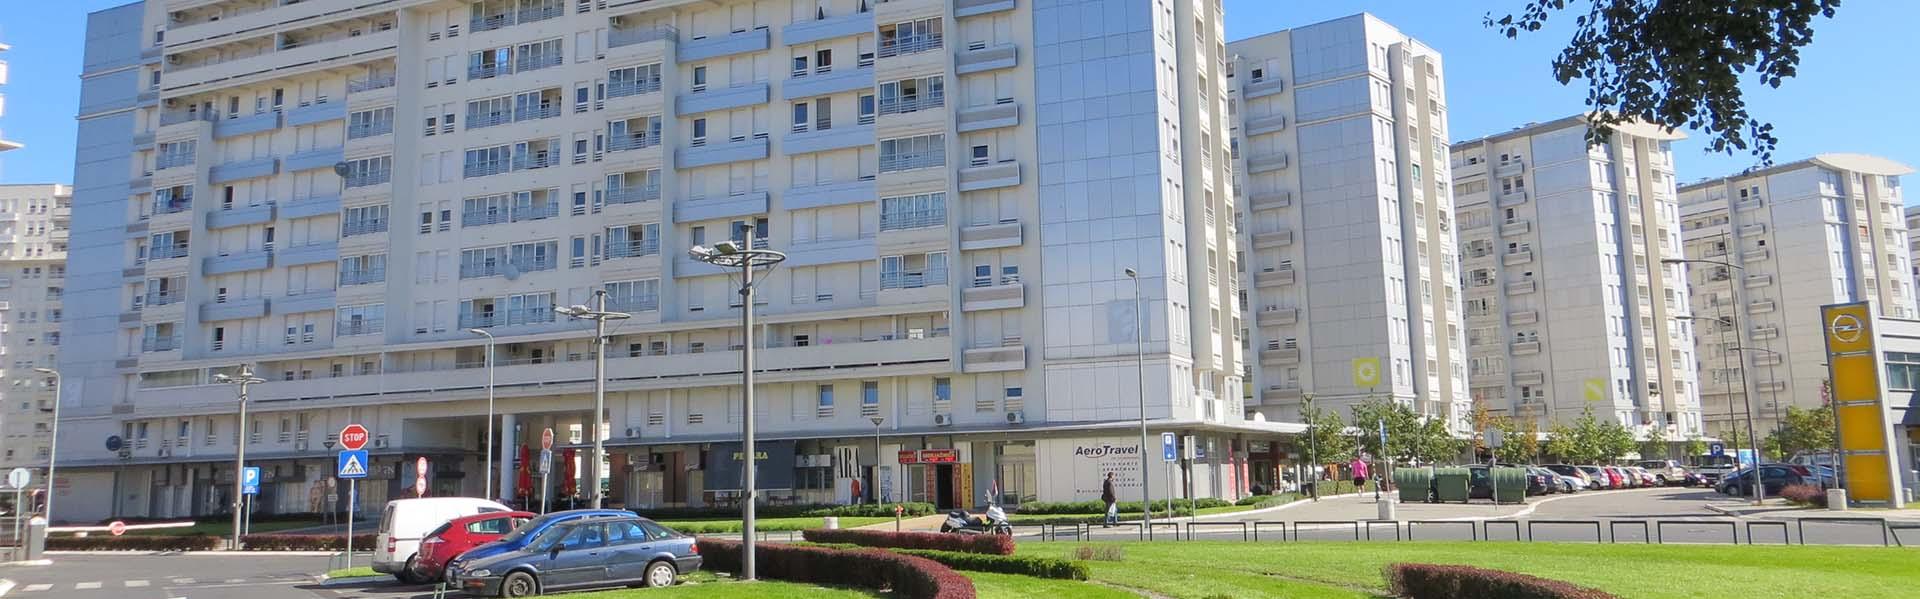 Dostava hrane Belvil (blok 67)| Beograd